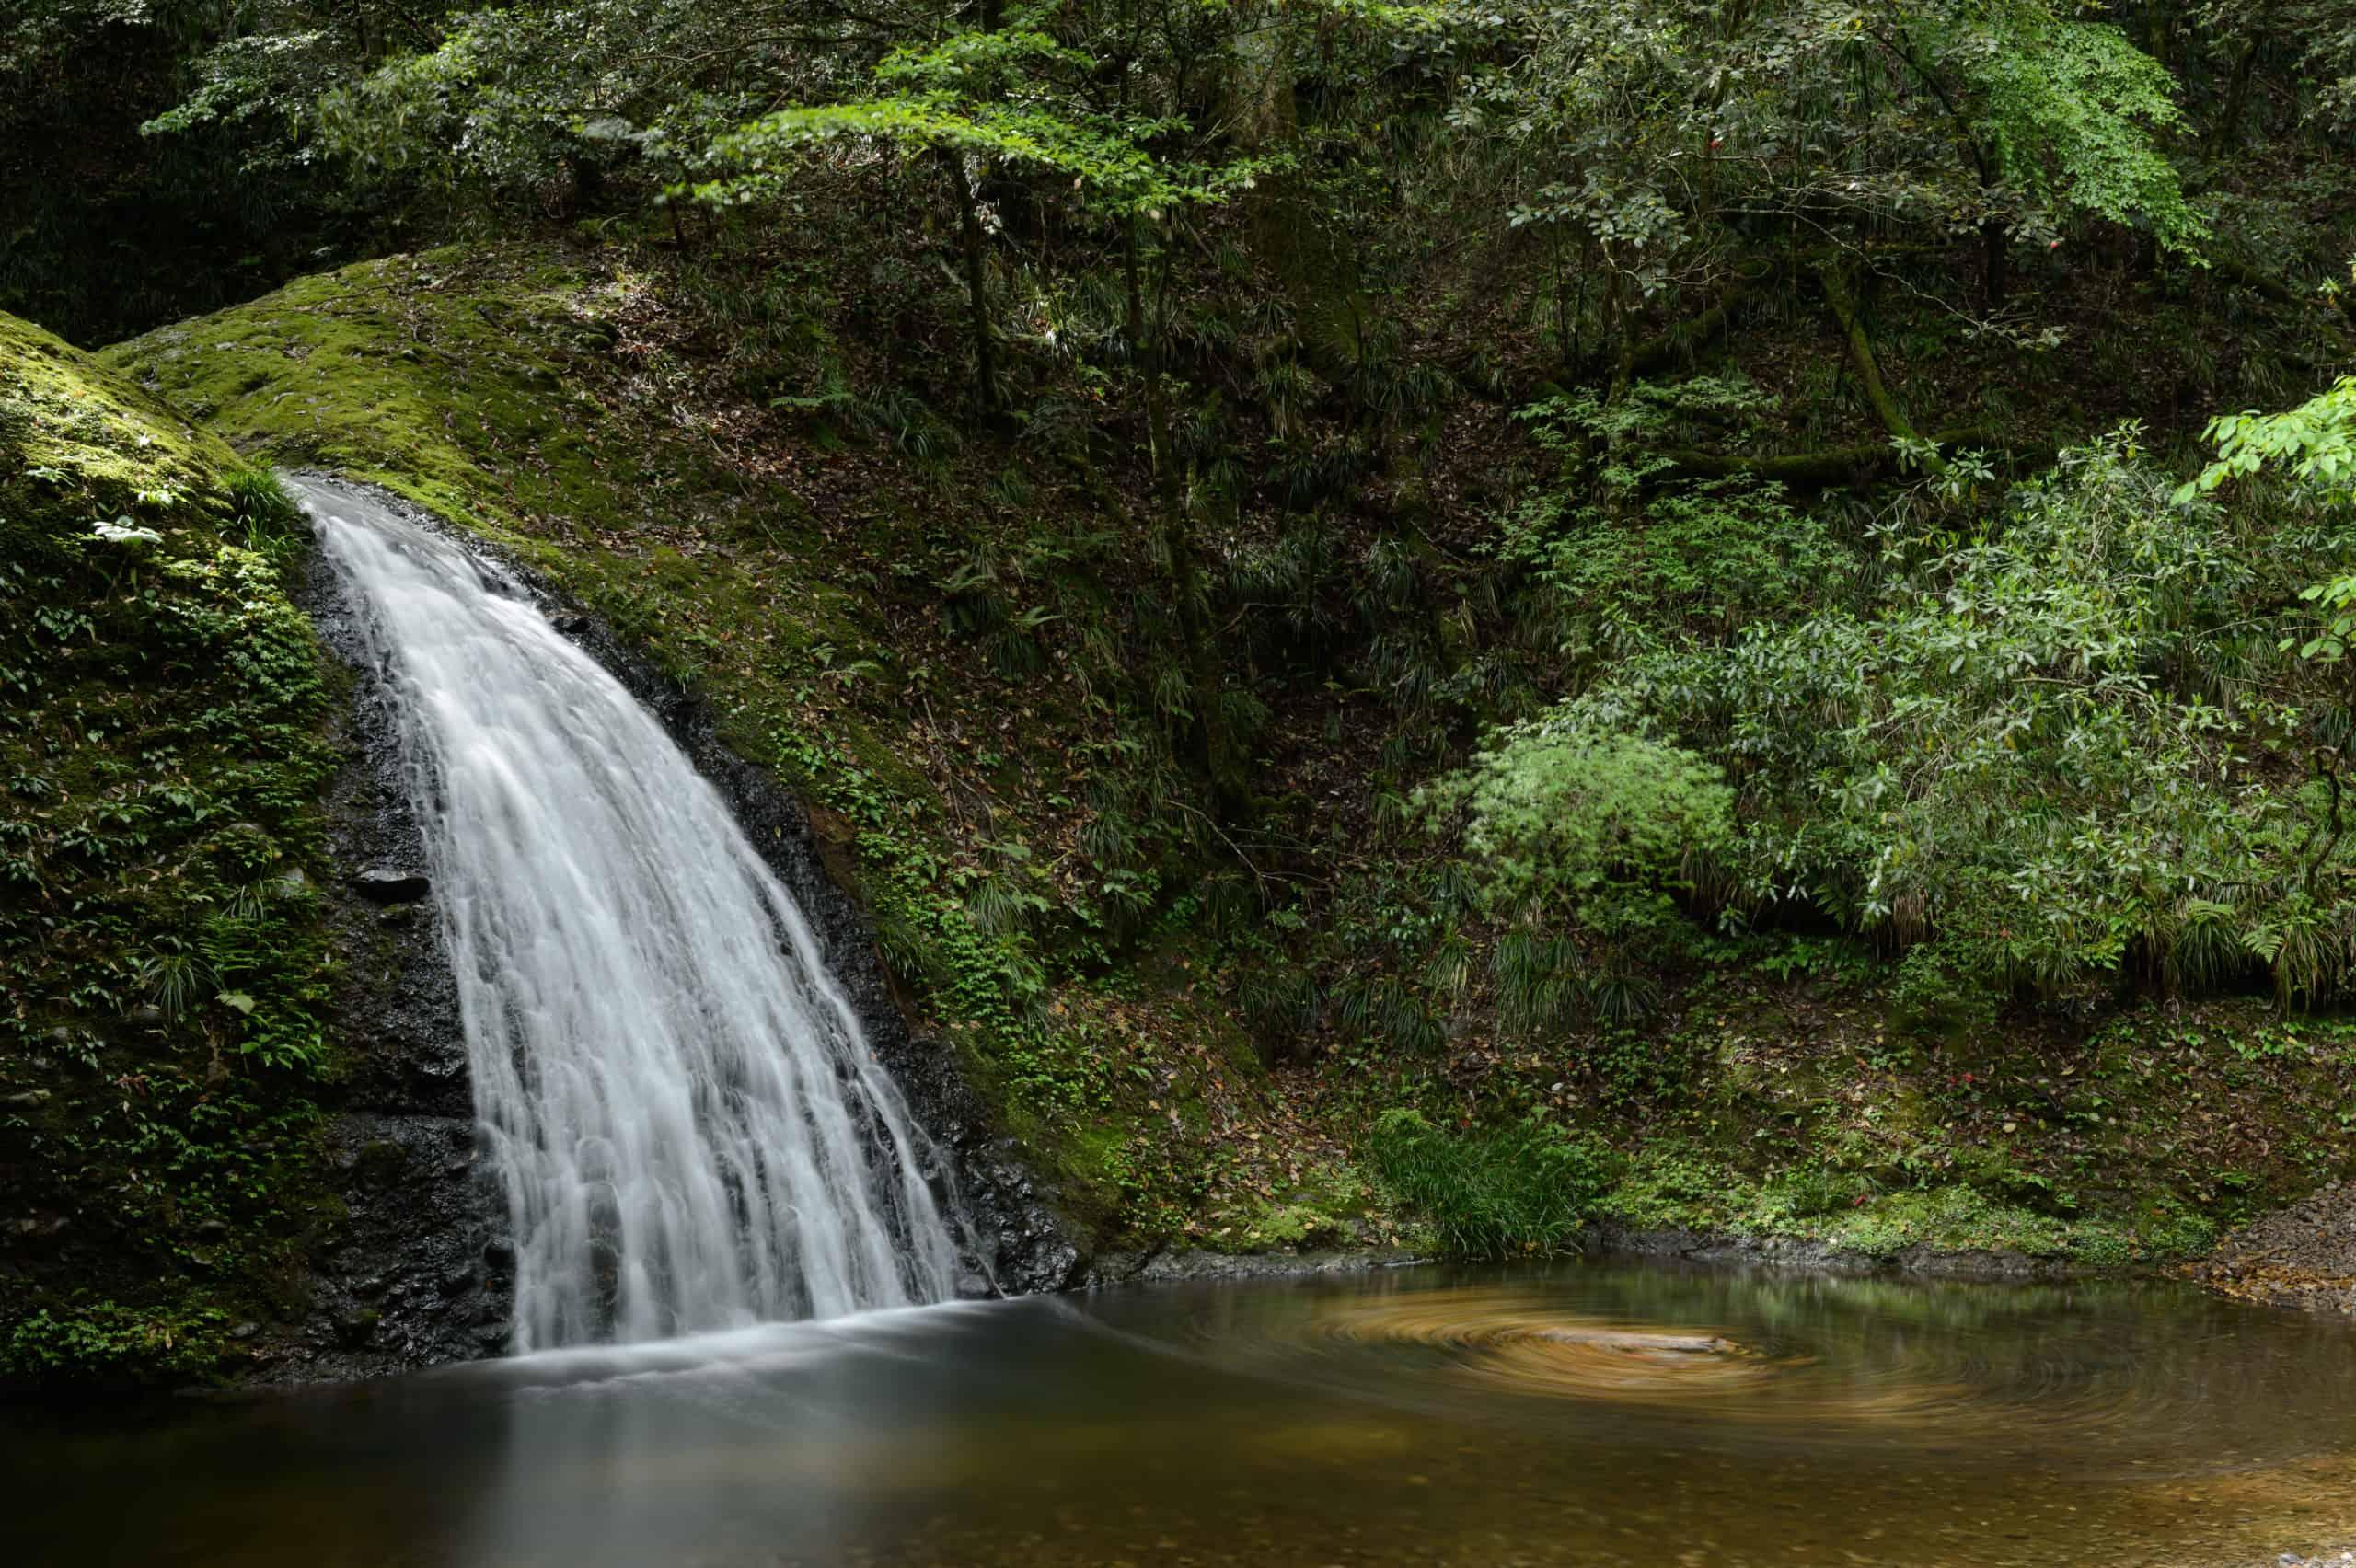 Japanese Waterfalls - Atera Seven Falls